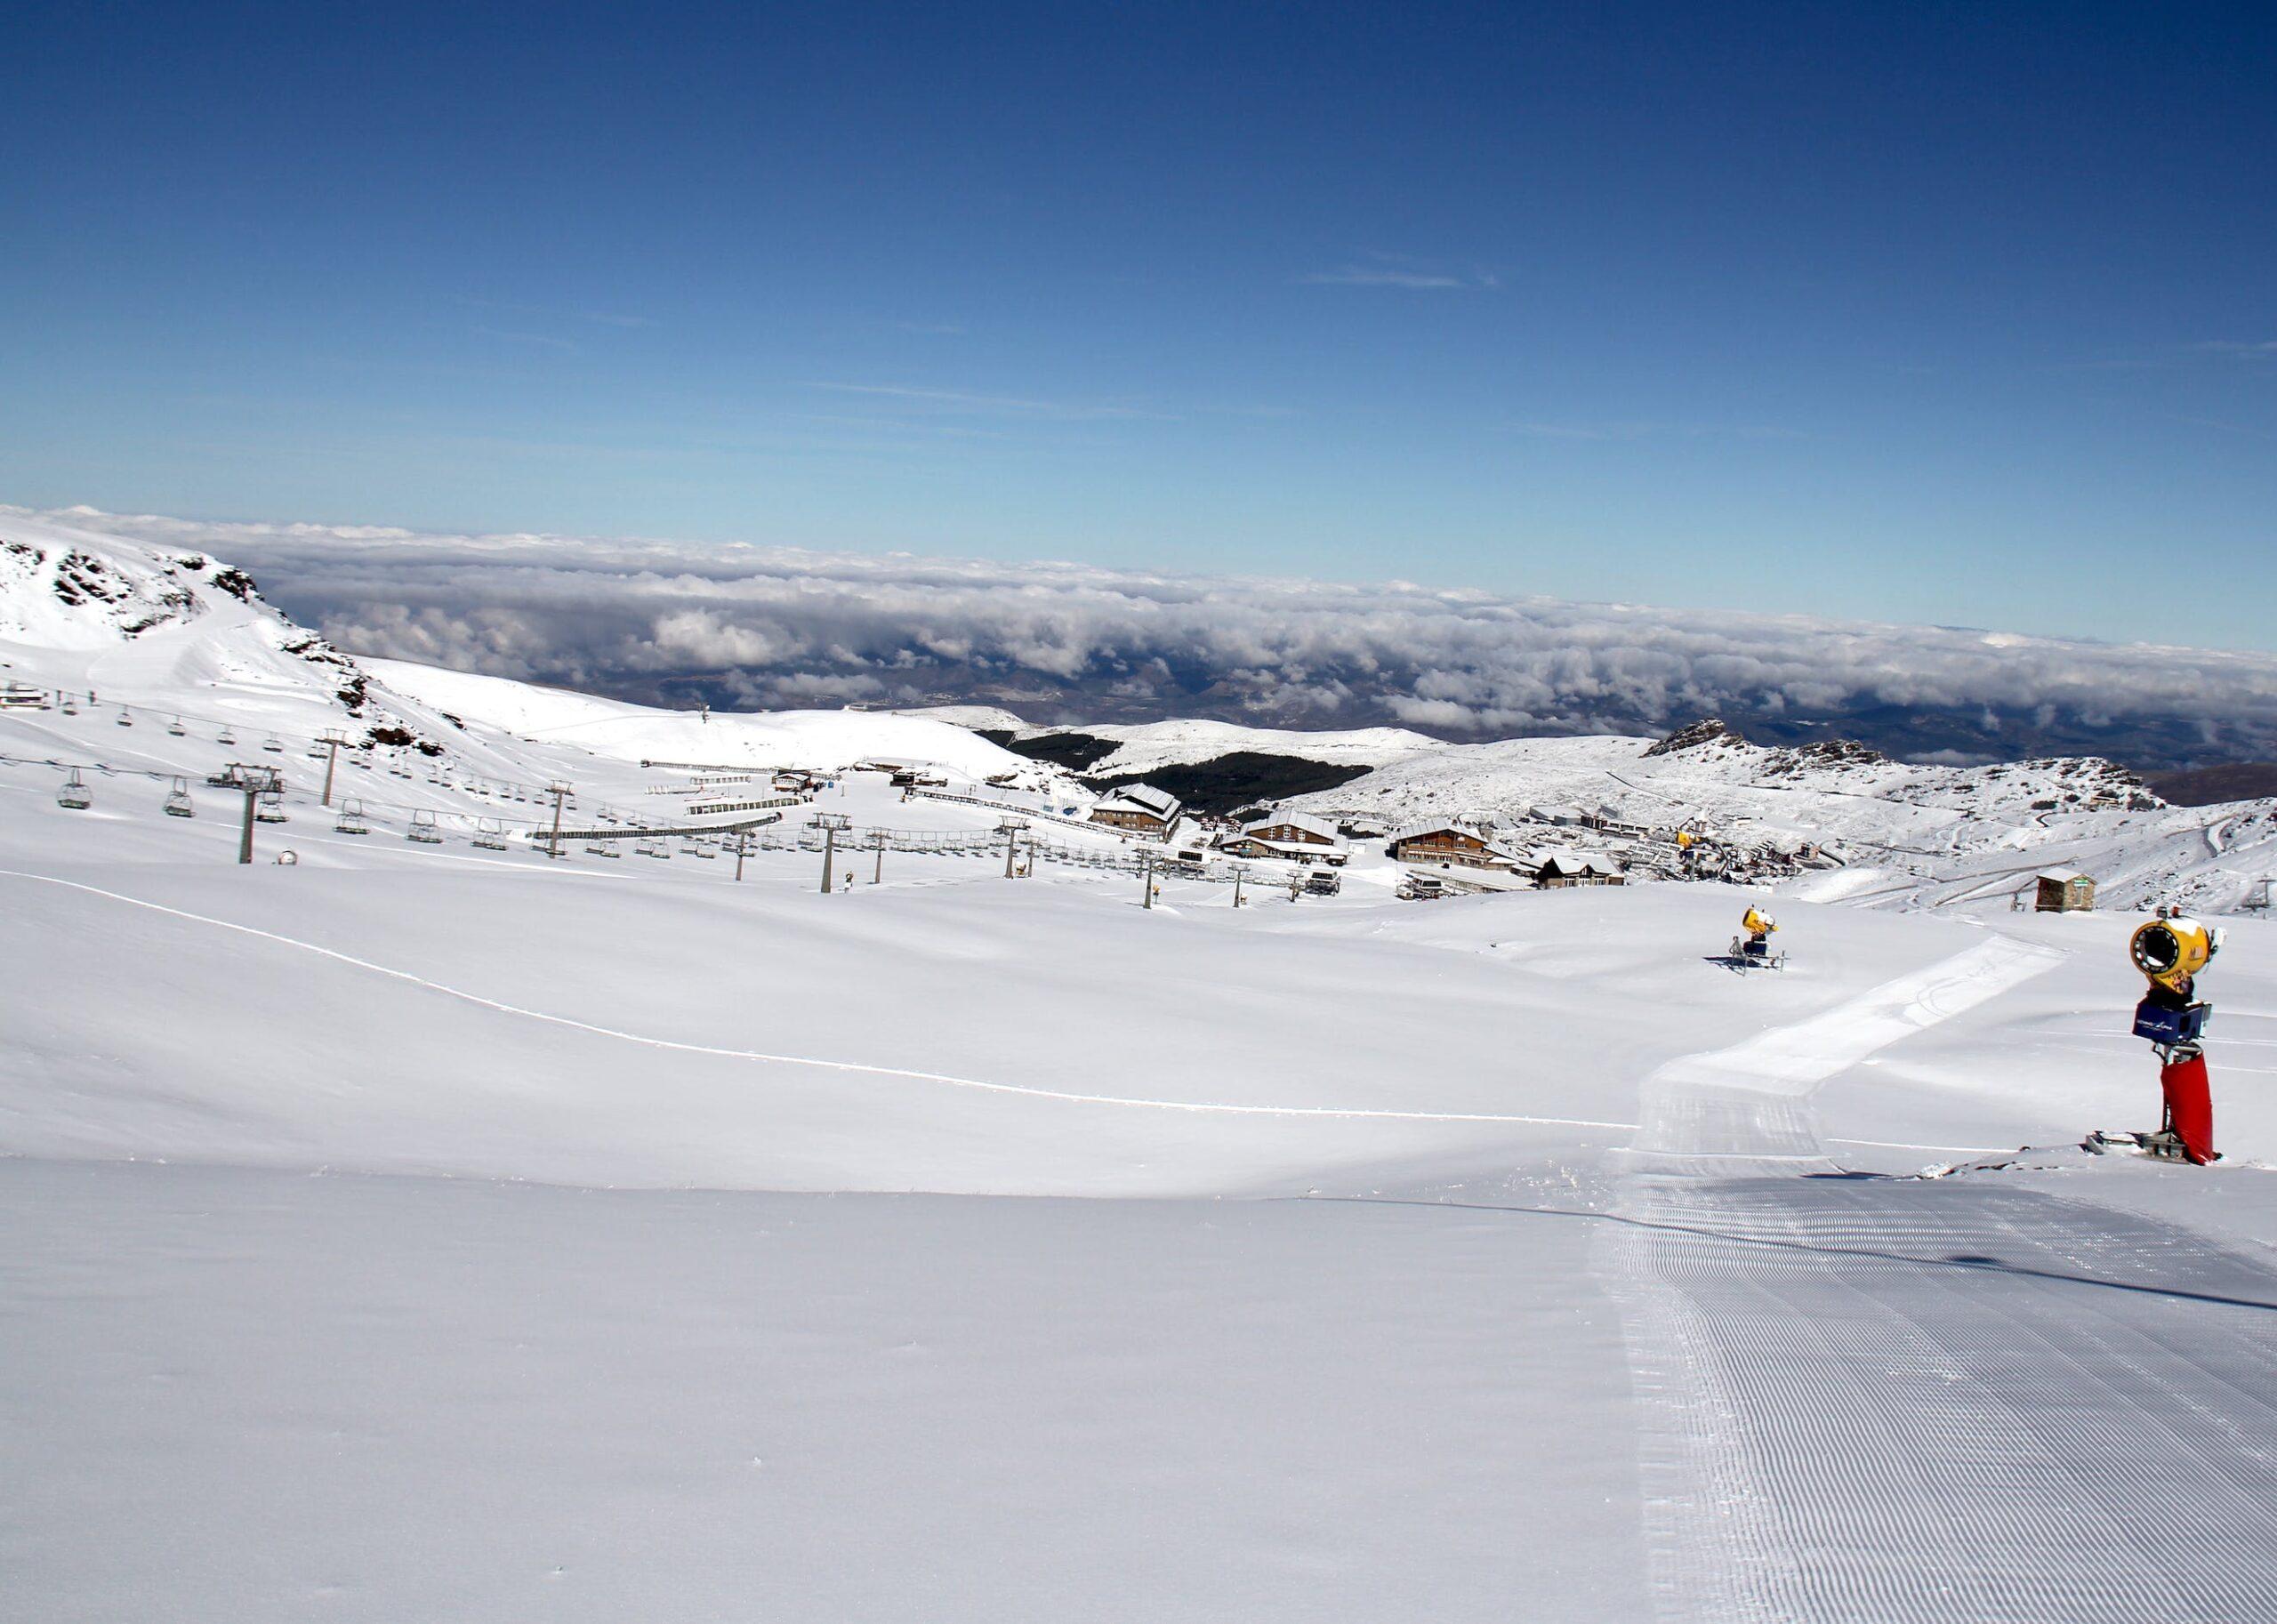 Image of pisado4 2 scaled in Cosentino, Official Sponsor of Sierra Nevada's Ski Resort - Cosentino